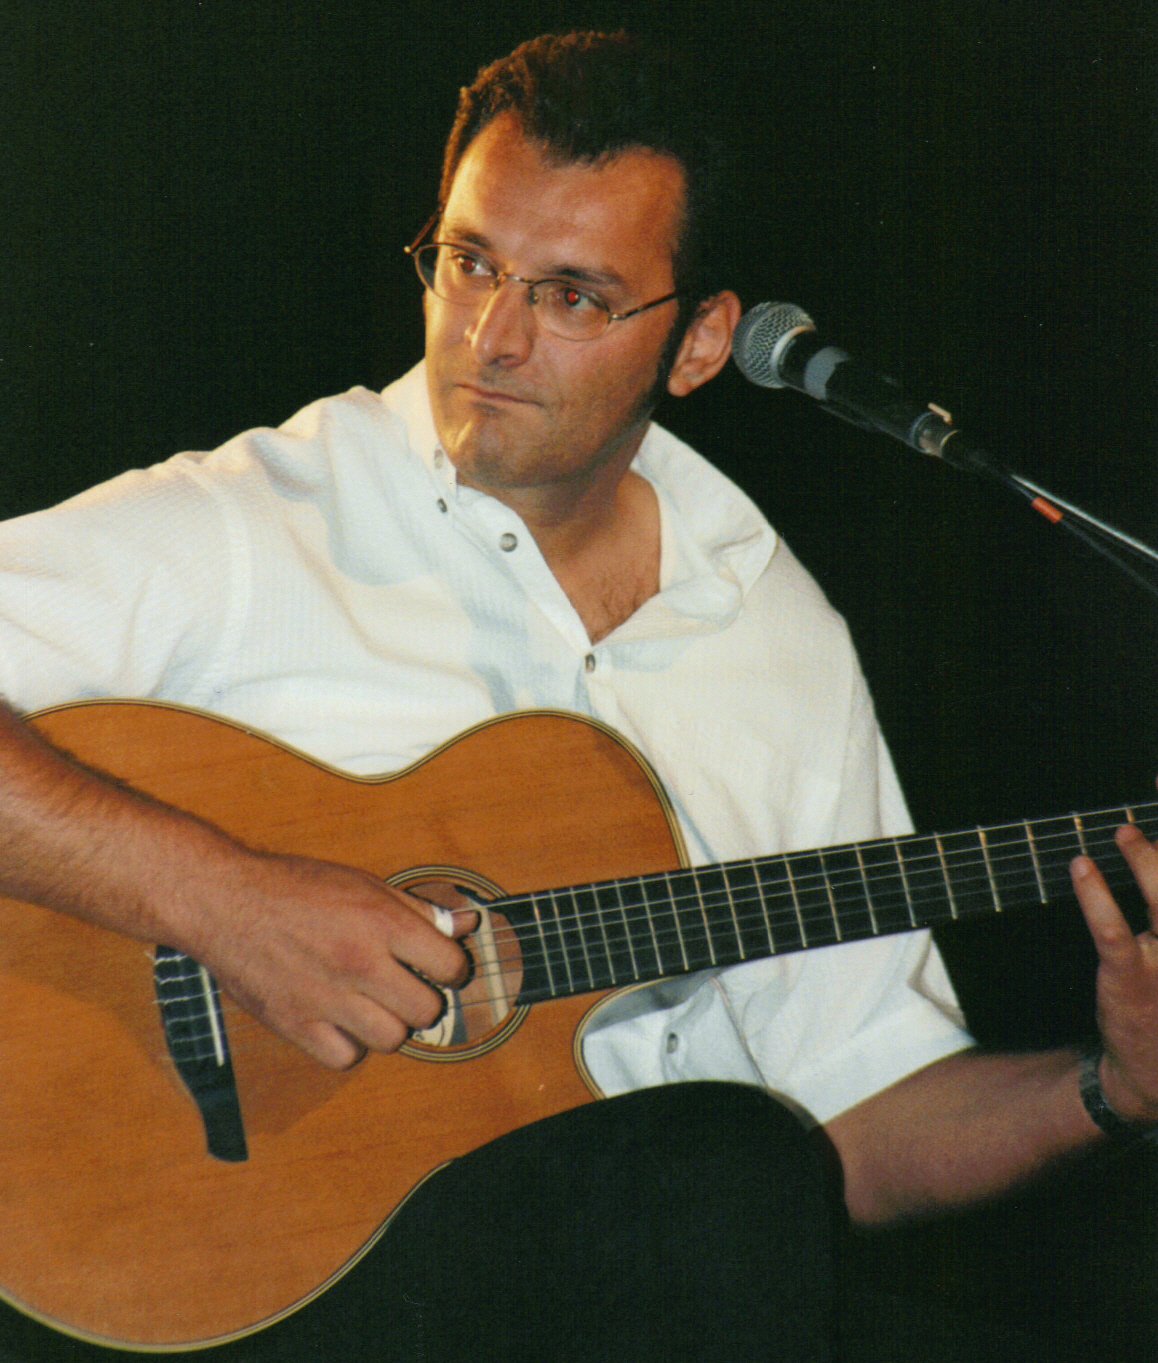 Bruno_Granier_Théâtre_de_la_Mer_Sète_2001